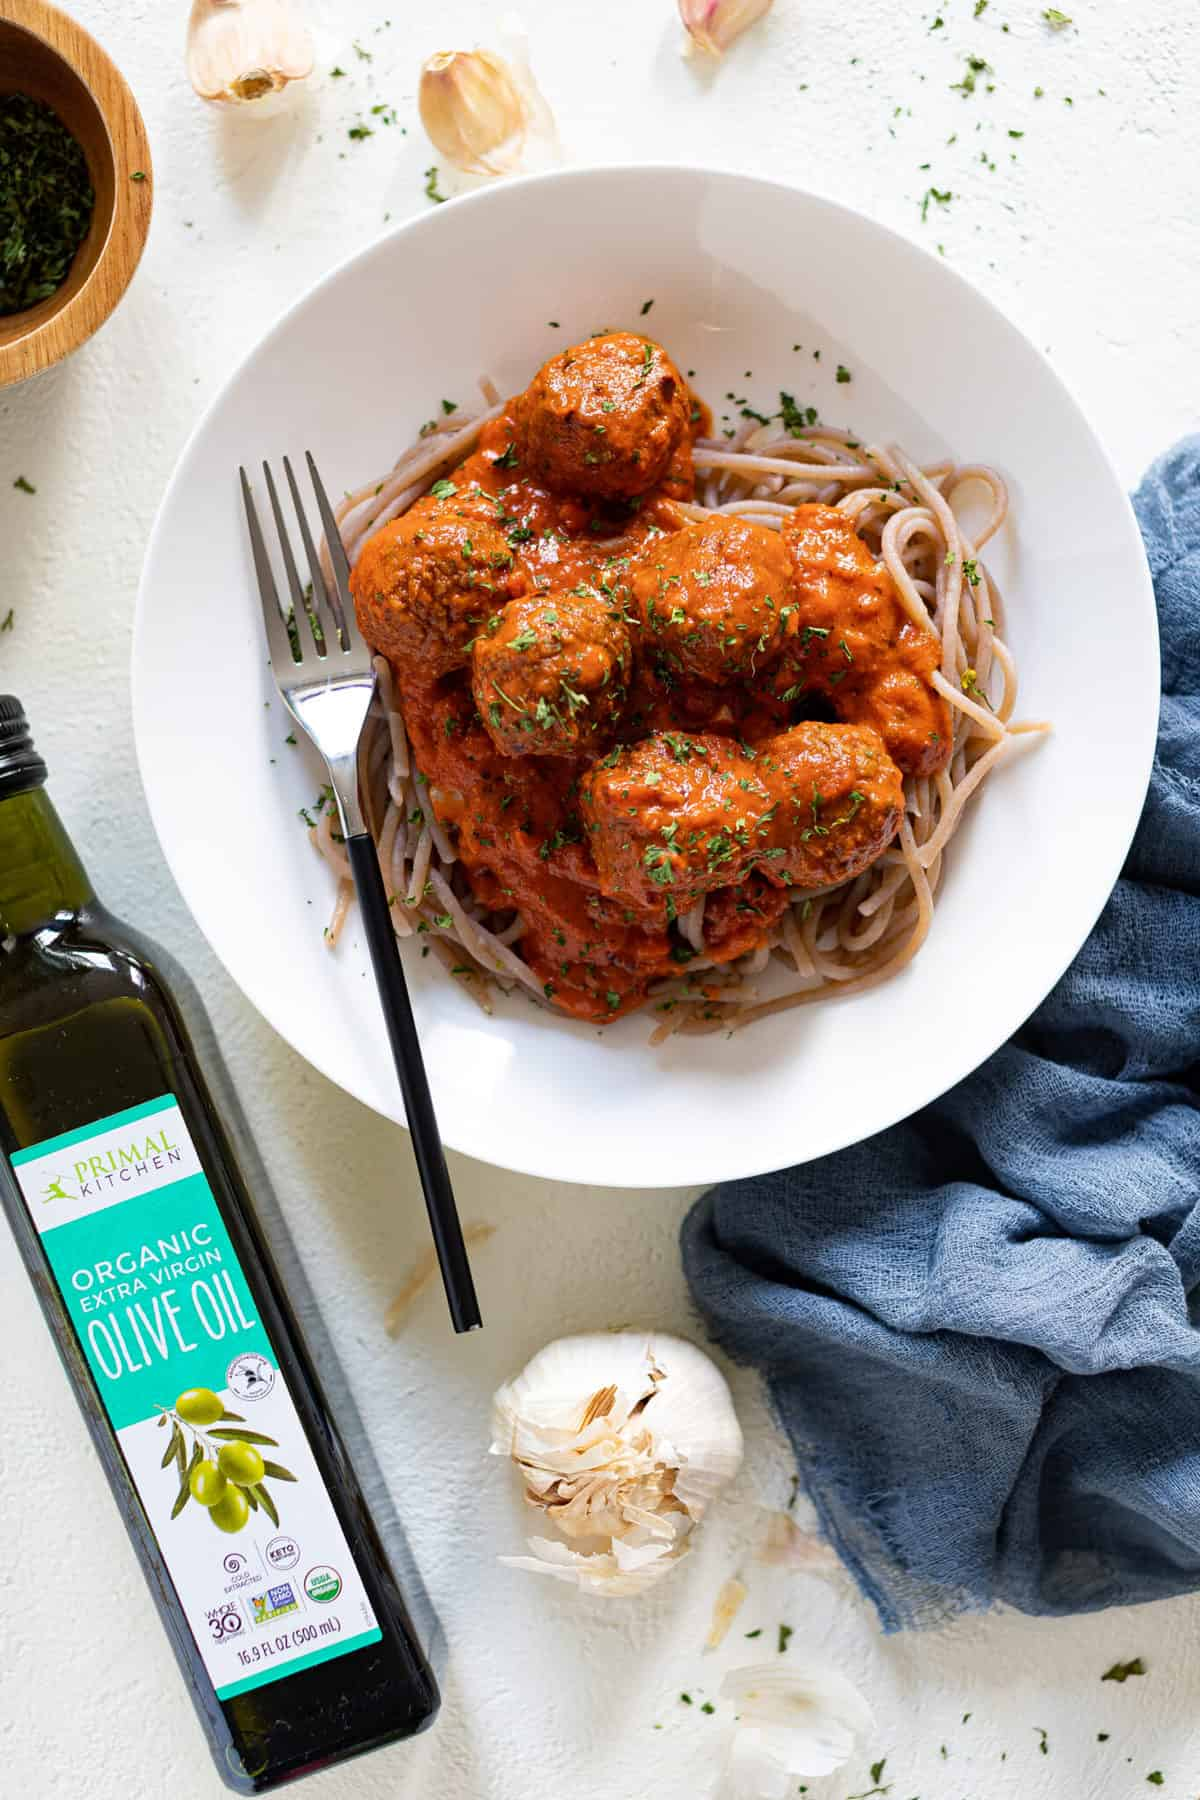 Vegan Spaghetti + Meatballs in Vodka Sauce